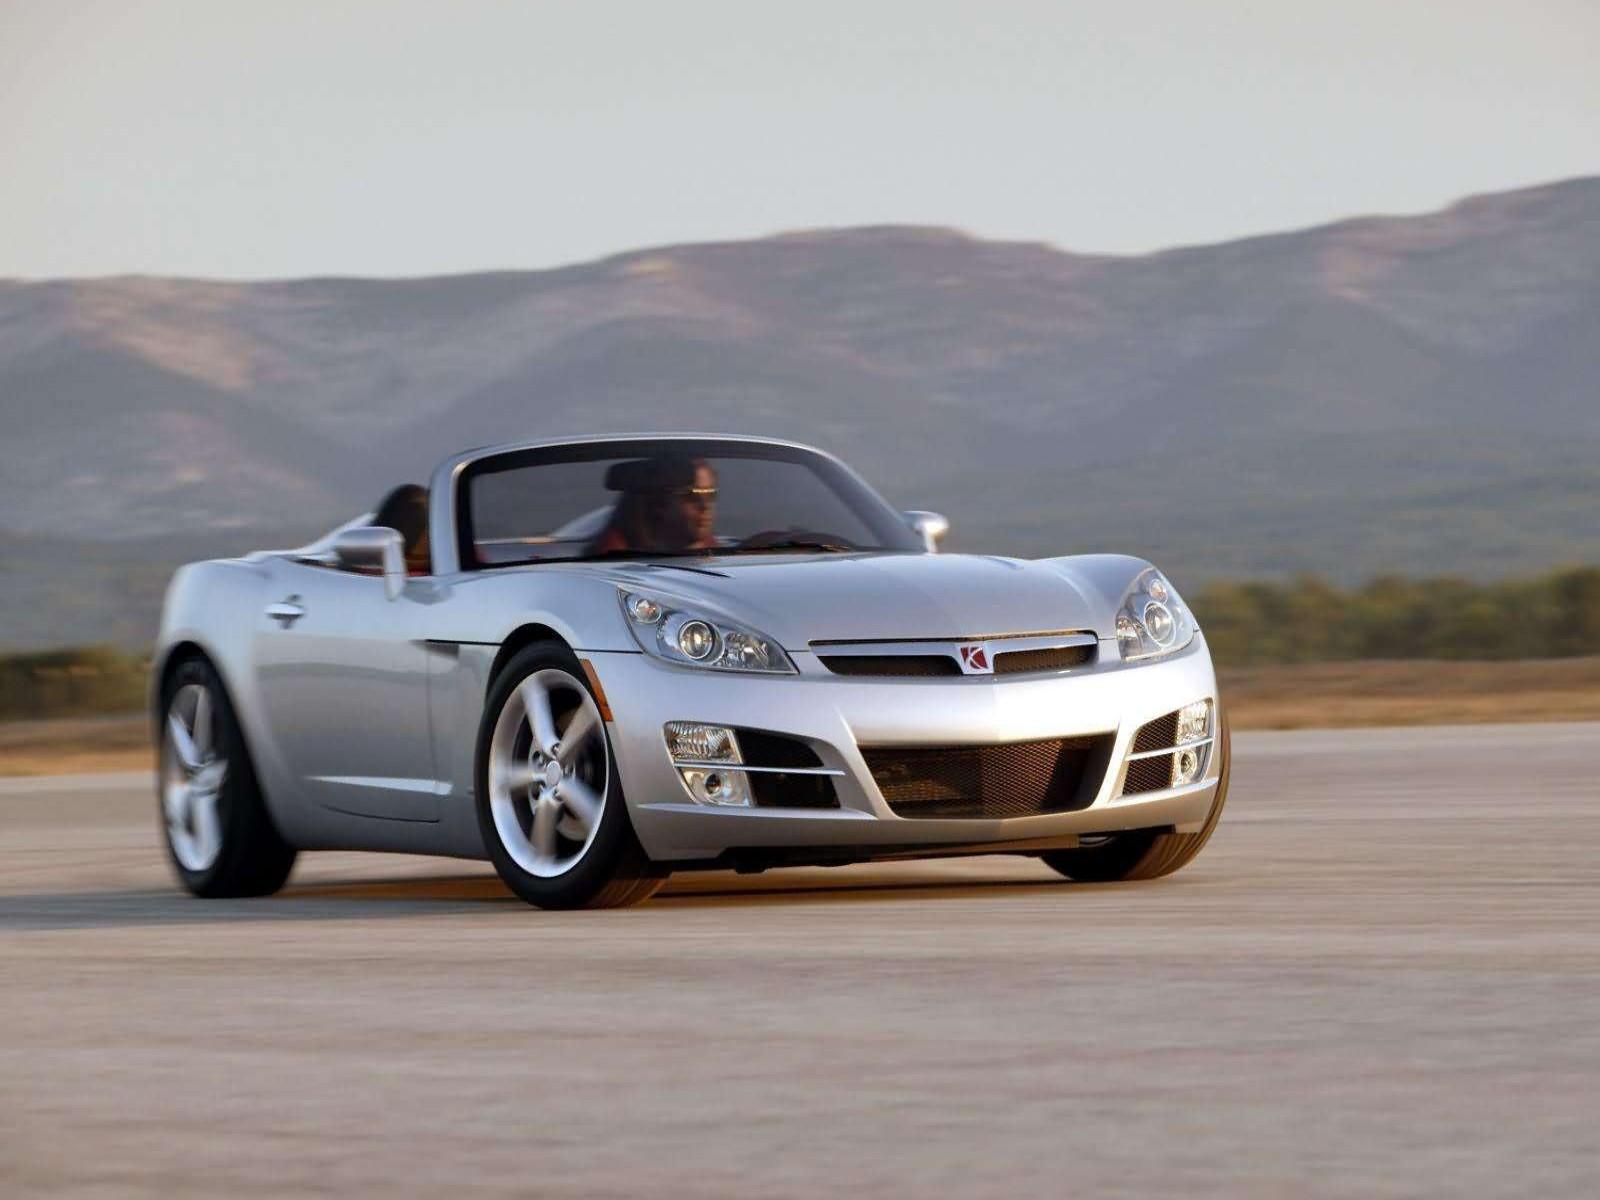 Saturn sports car